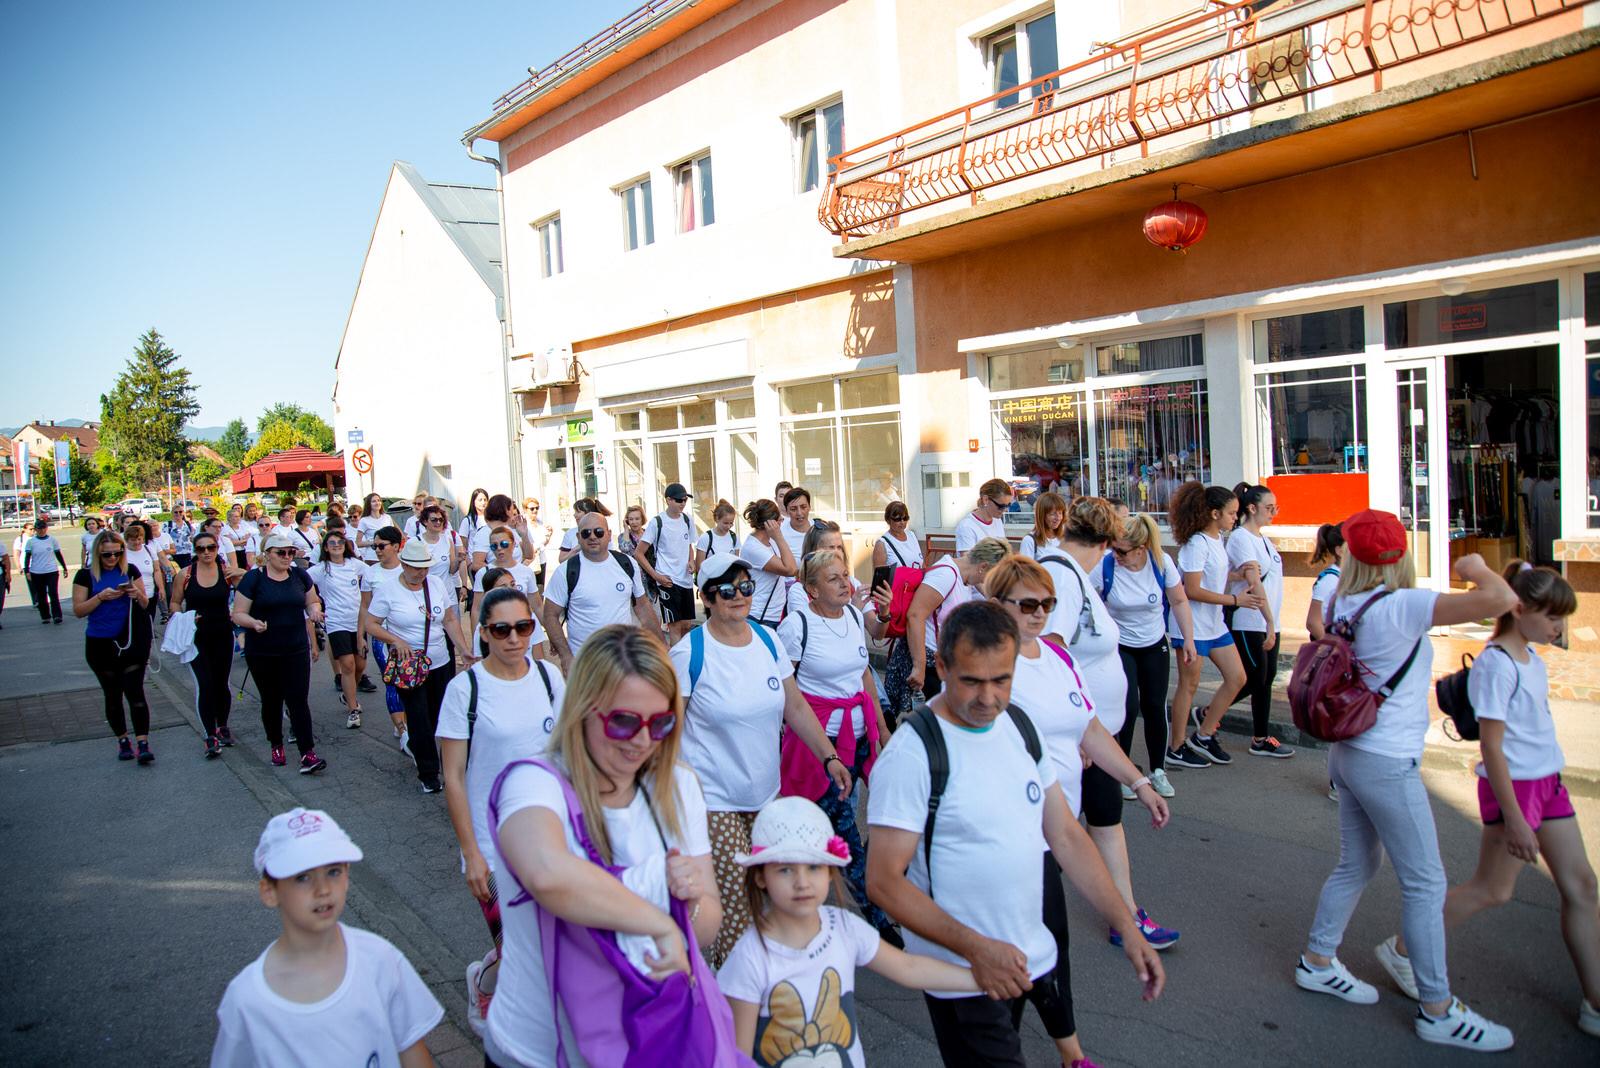 likaclub_gospić_hodanjem do zdravlja 2020 (30)